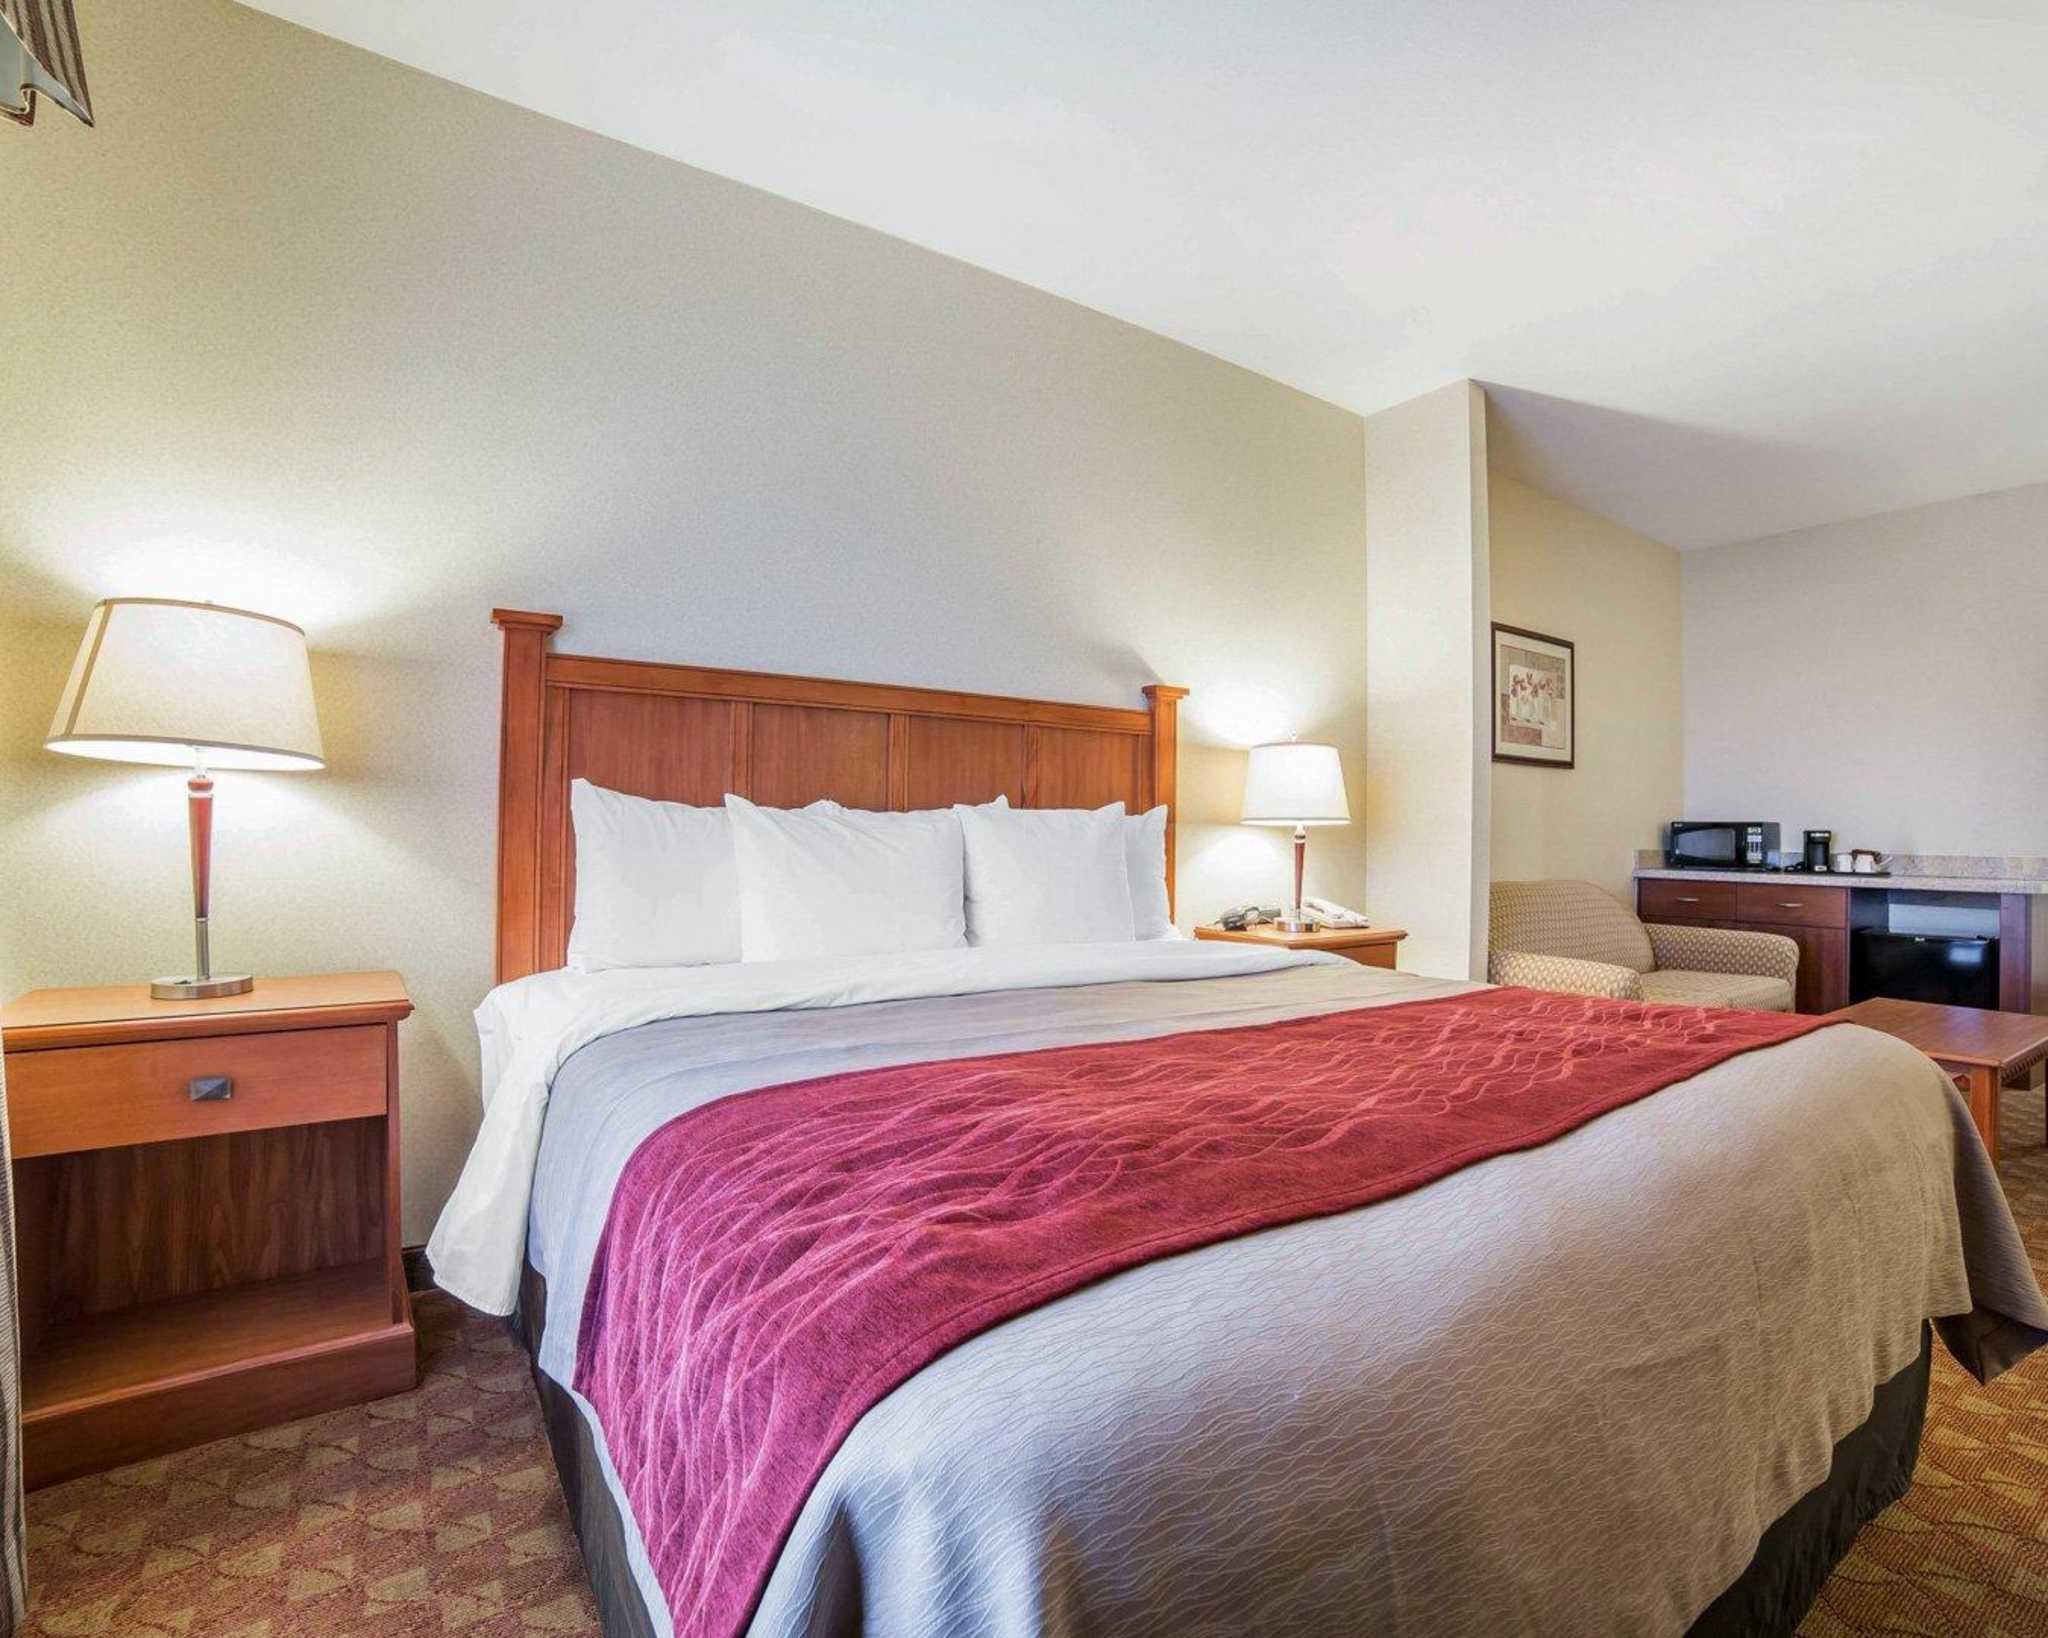 Comfort Inn & Suites Las Vegas - Nellis image 15